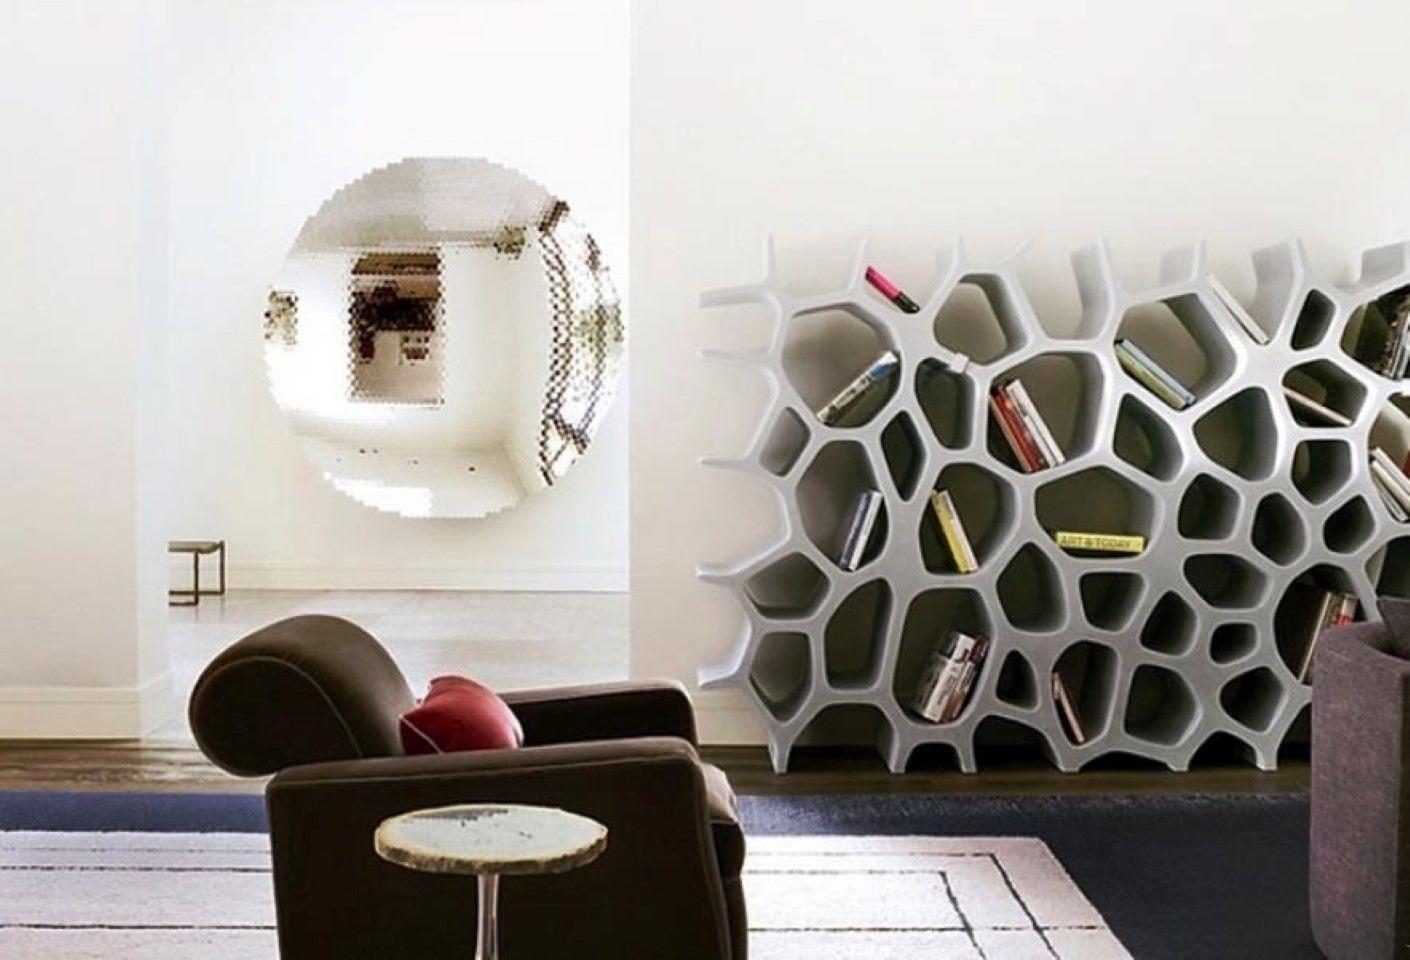 Round Wall Mirror In Futuristic Interior Design Plus Decorative Bookshelves Idea And Black Couch